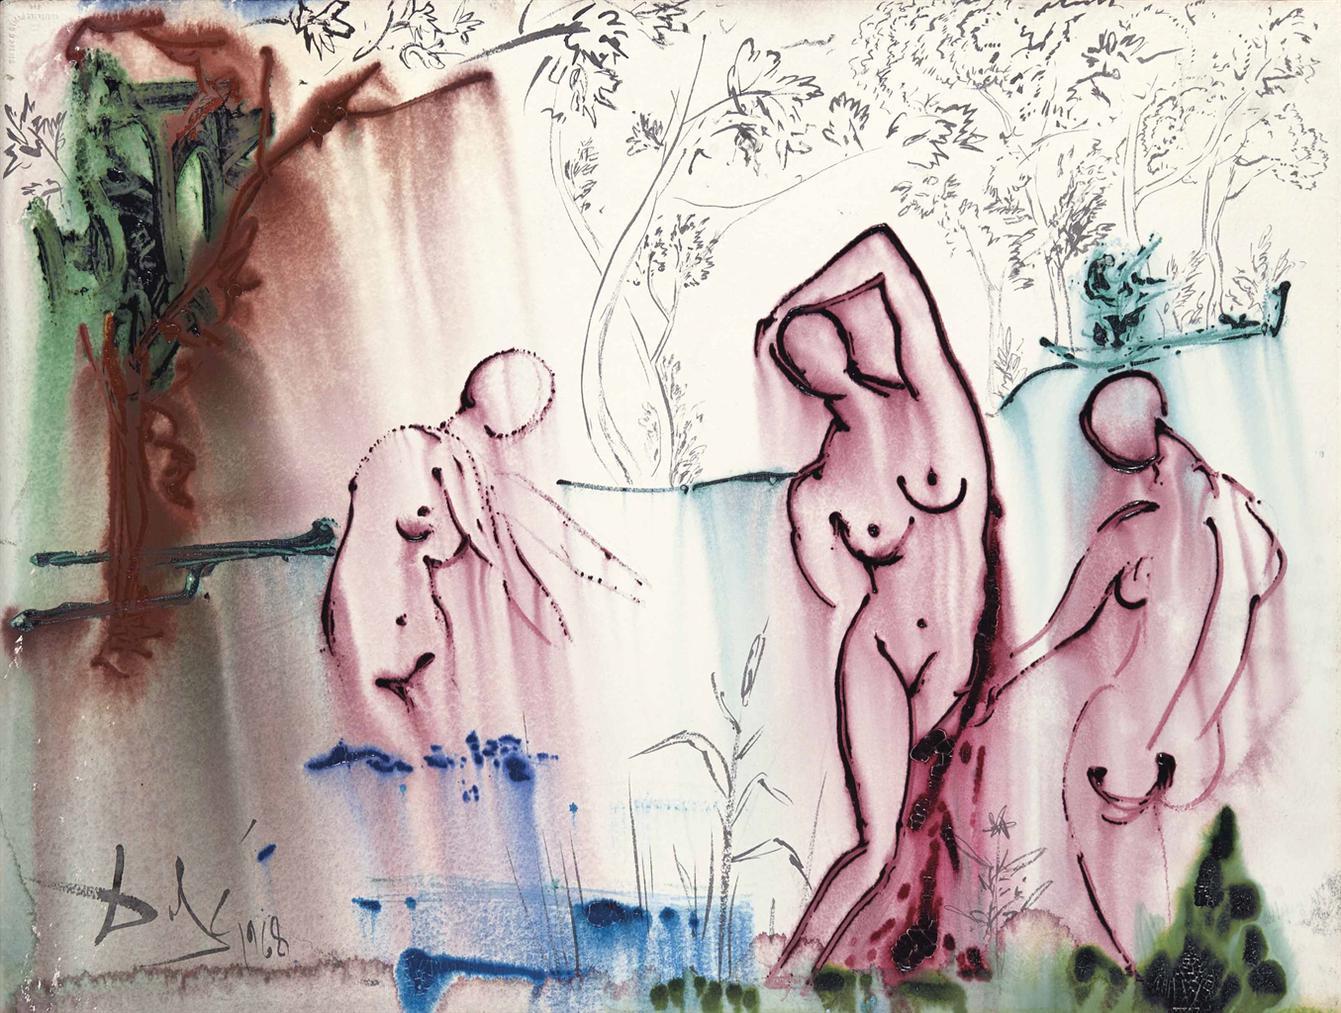 Salvador Dali-Le Bain, Etude Pour Lodyssee-1968